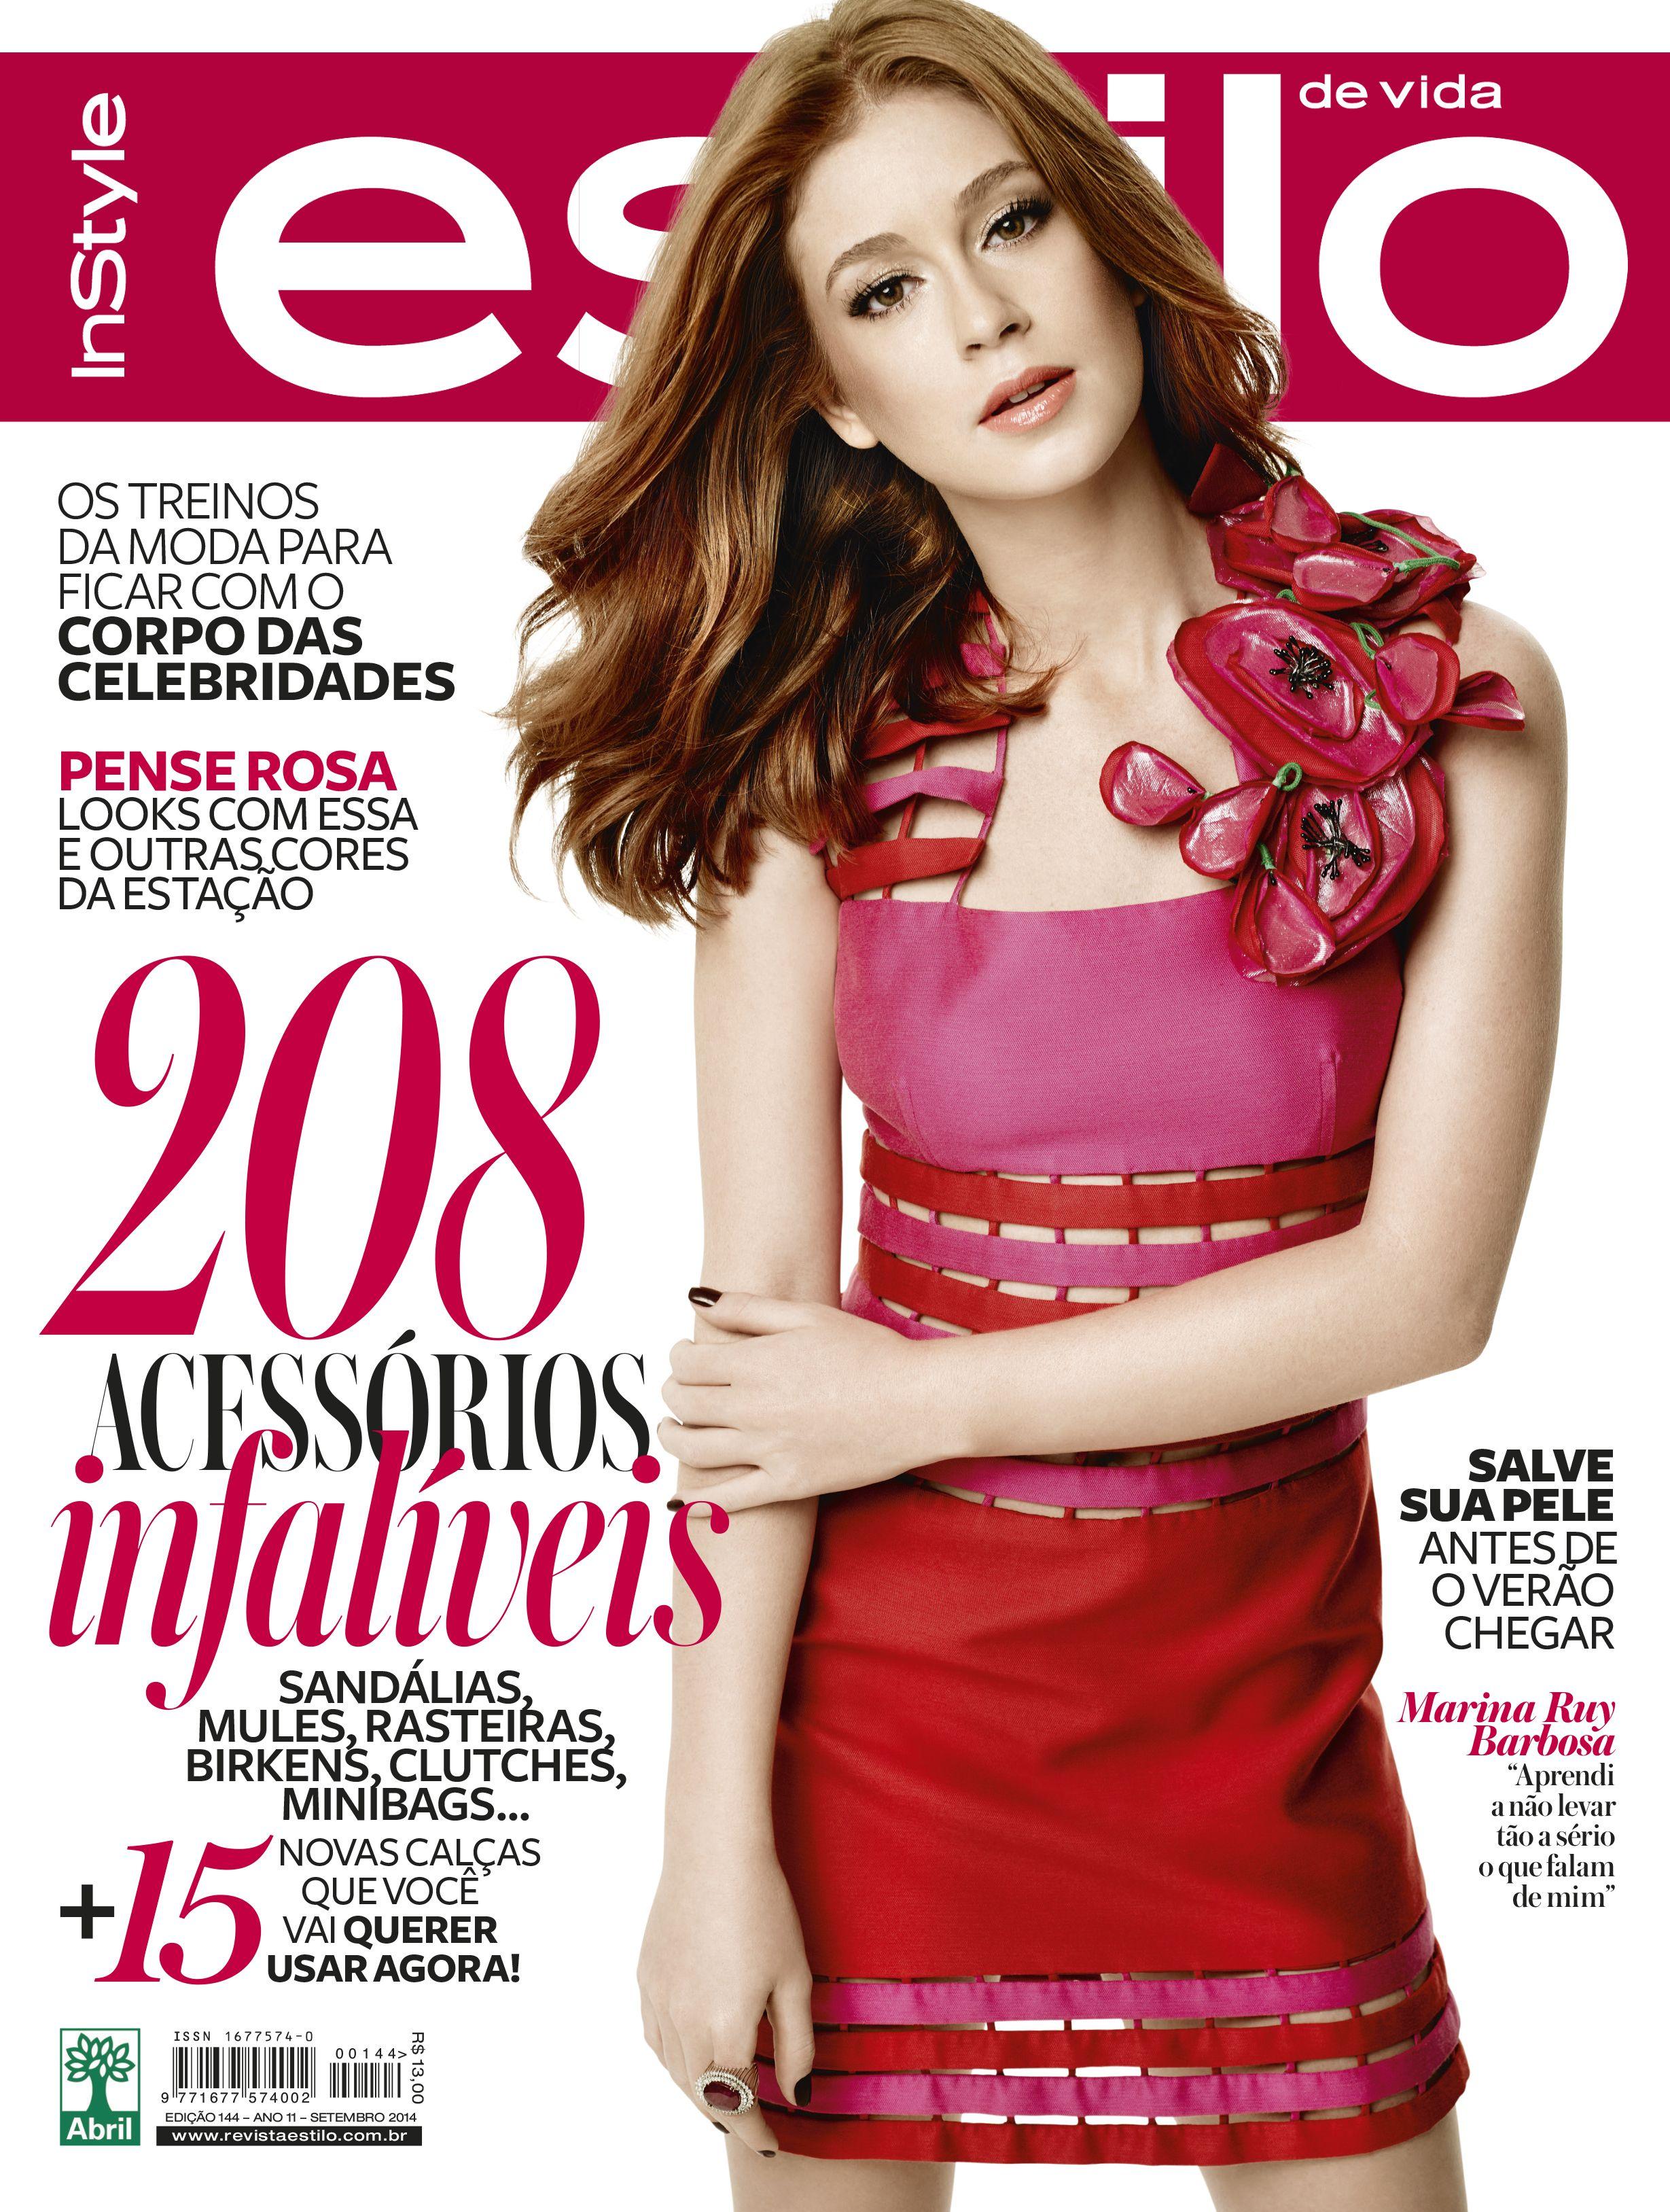 90d64c9e72d2b Edição 144 - Setembro de 2014 - Marina Ruy Barbosa   As capas de Estilo!